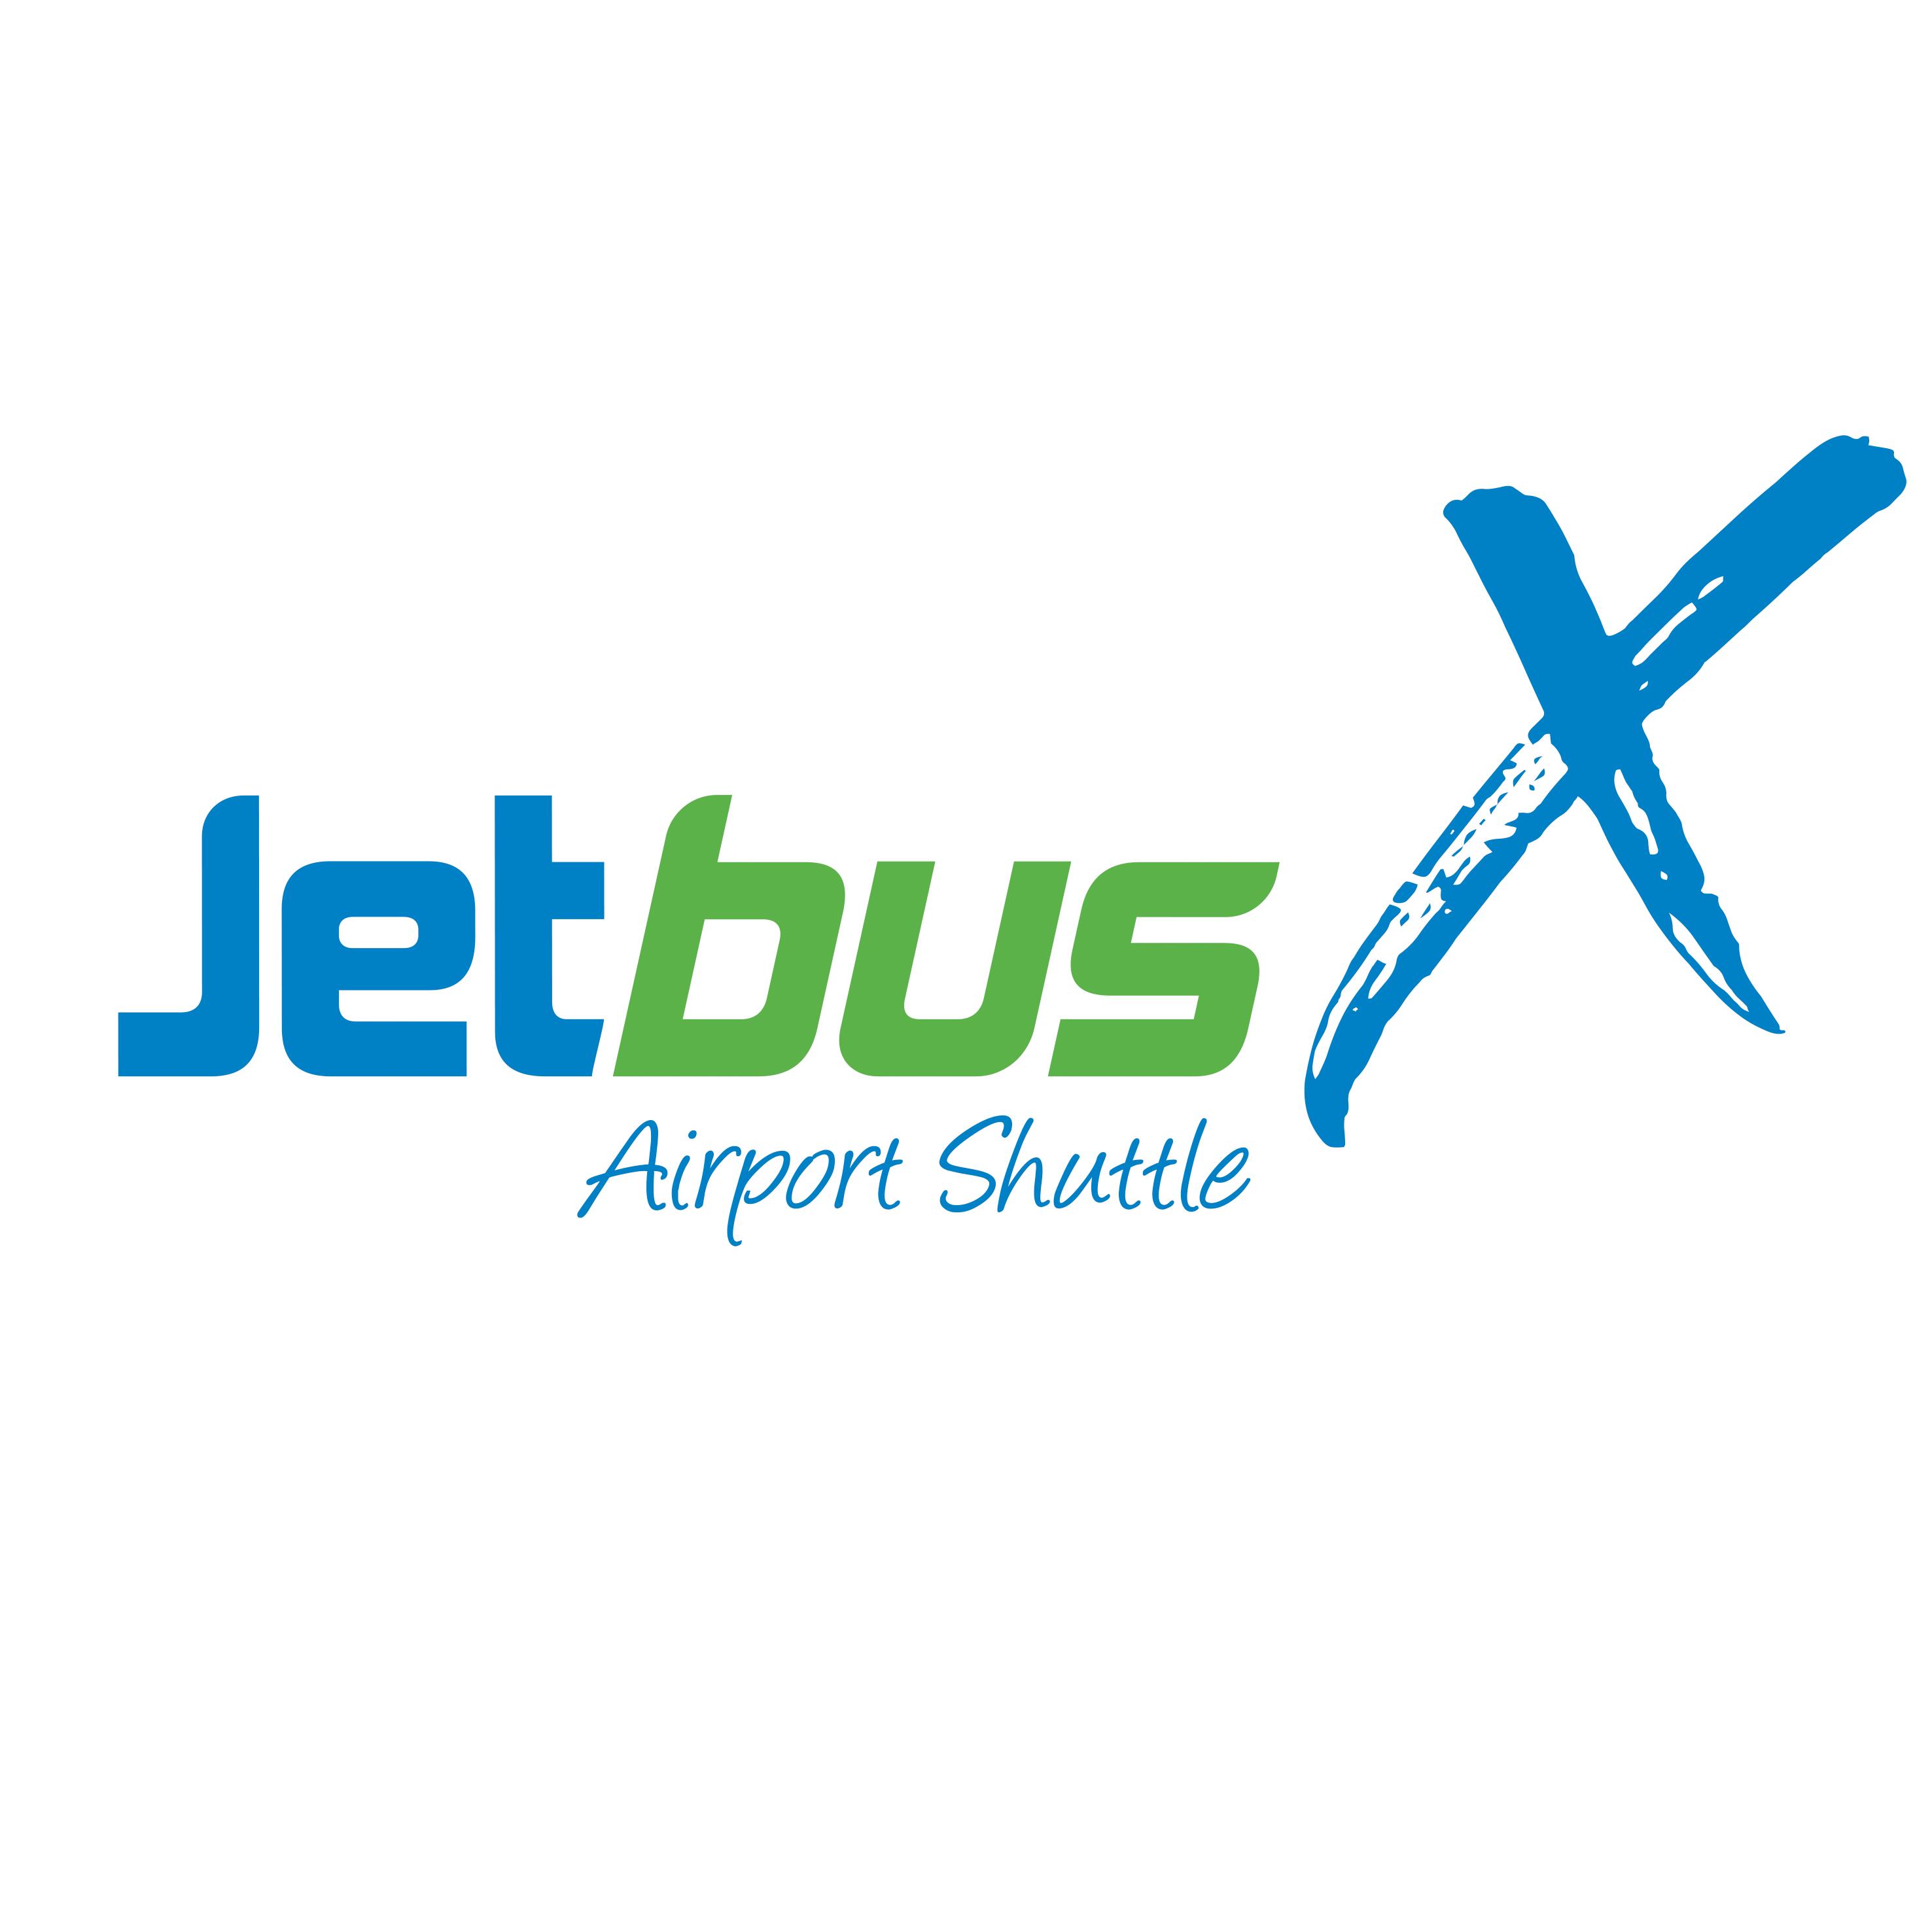 Jetbus X Airport Shuttle logo